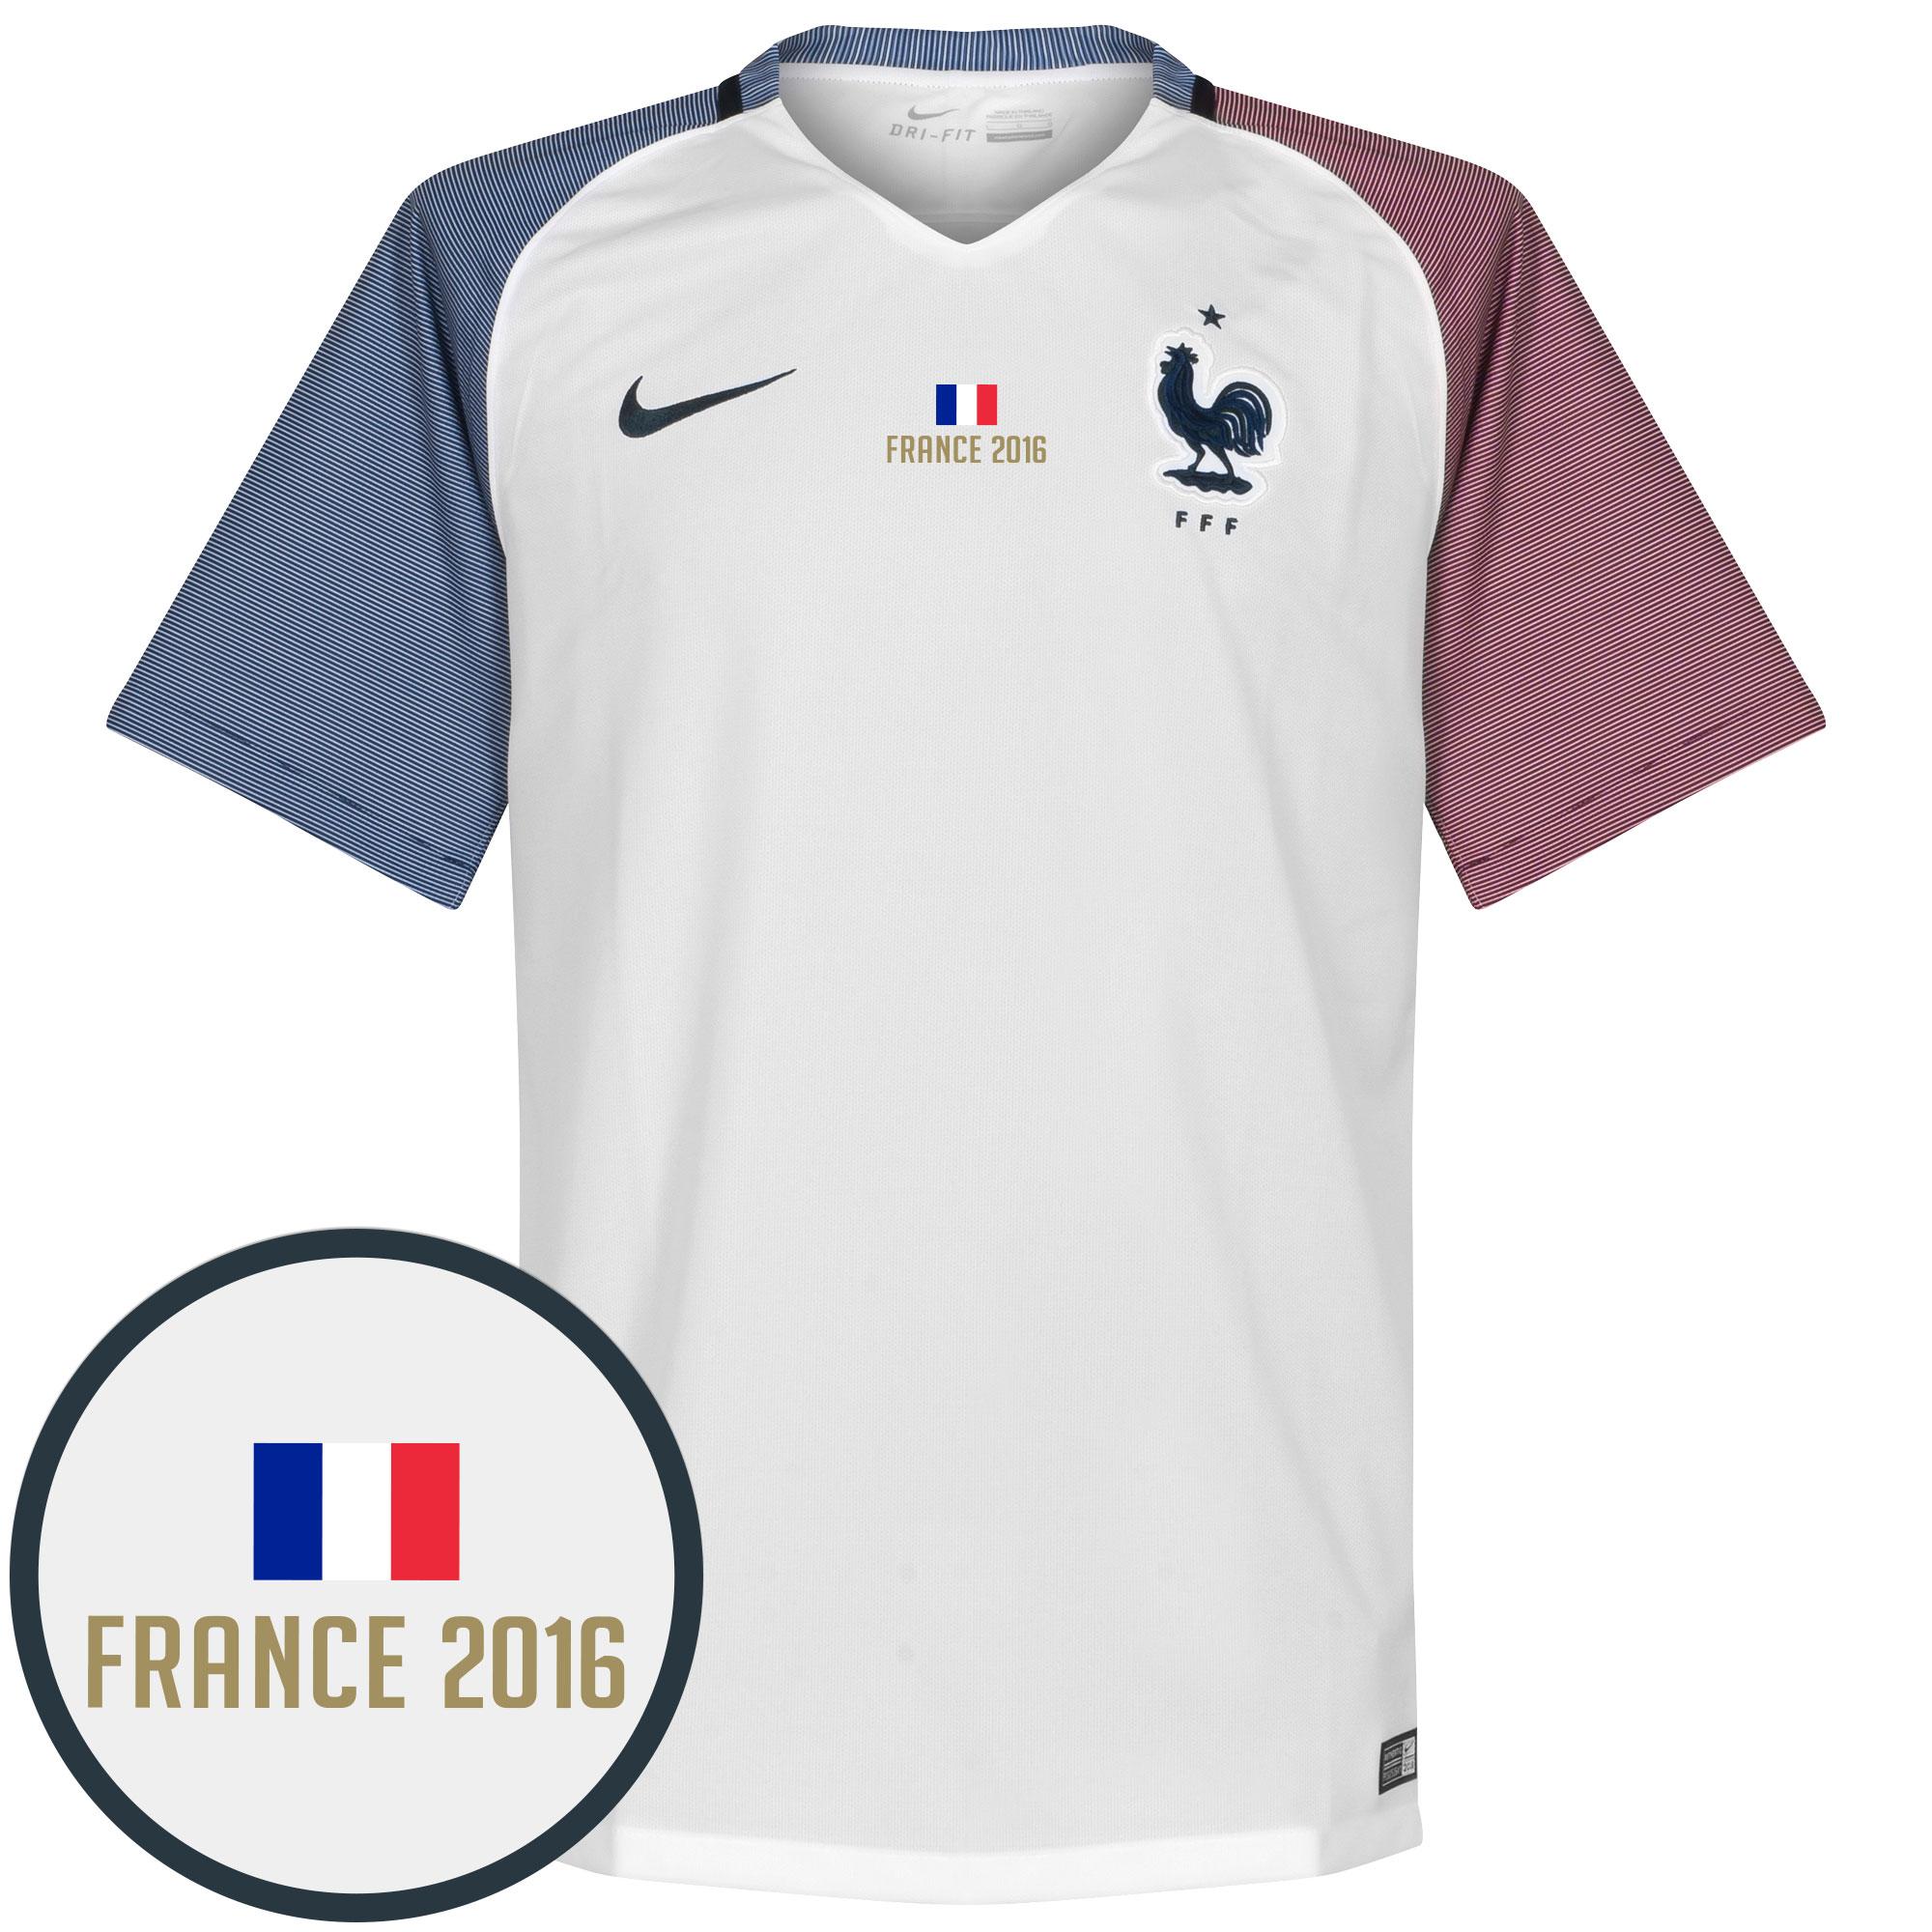 France Away Jersey 2016 / 2017 + France 2016 Transfer - XL